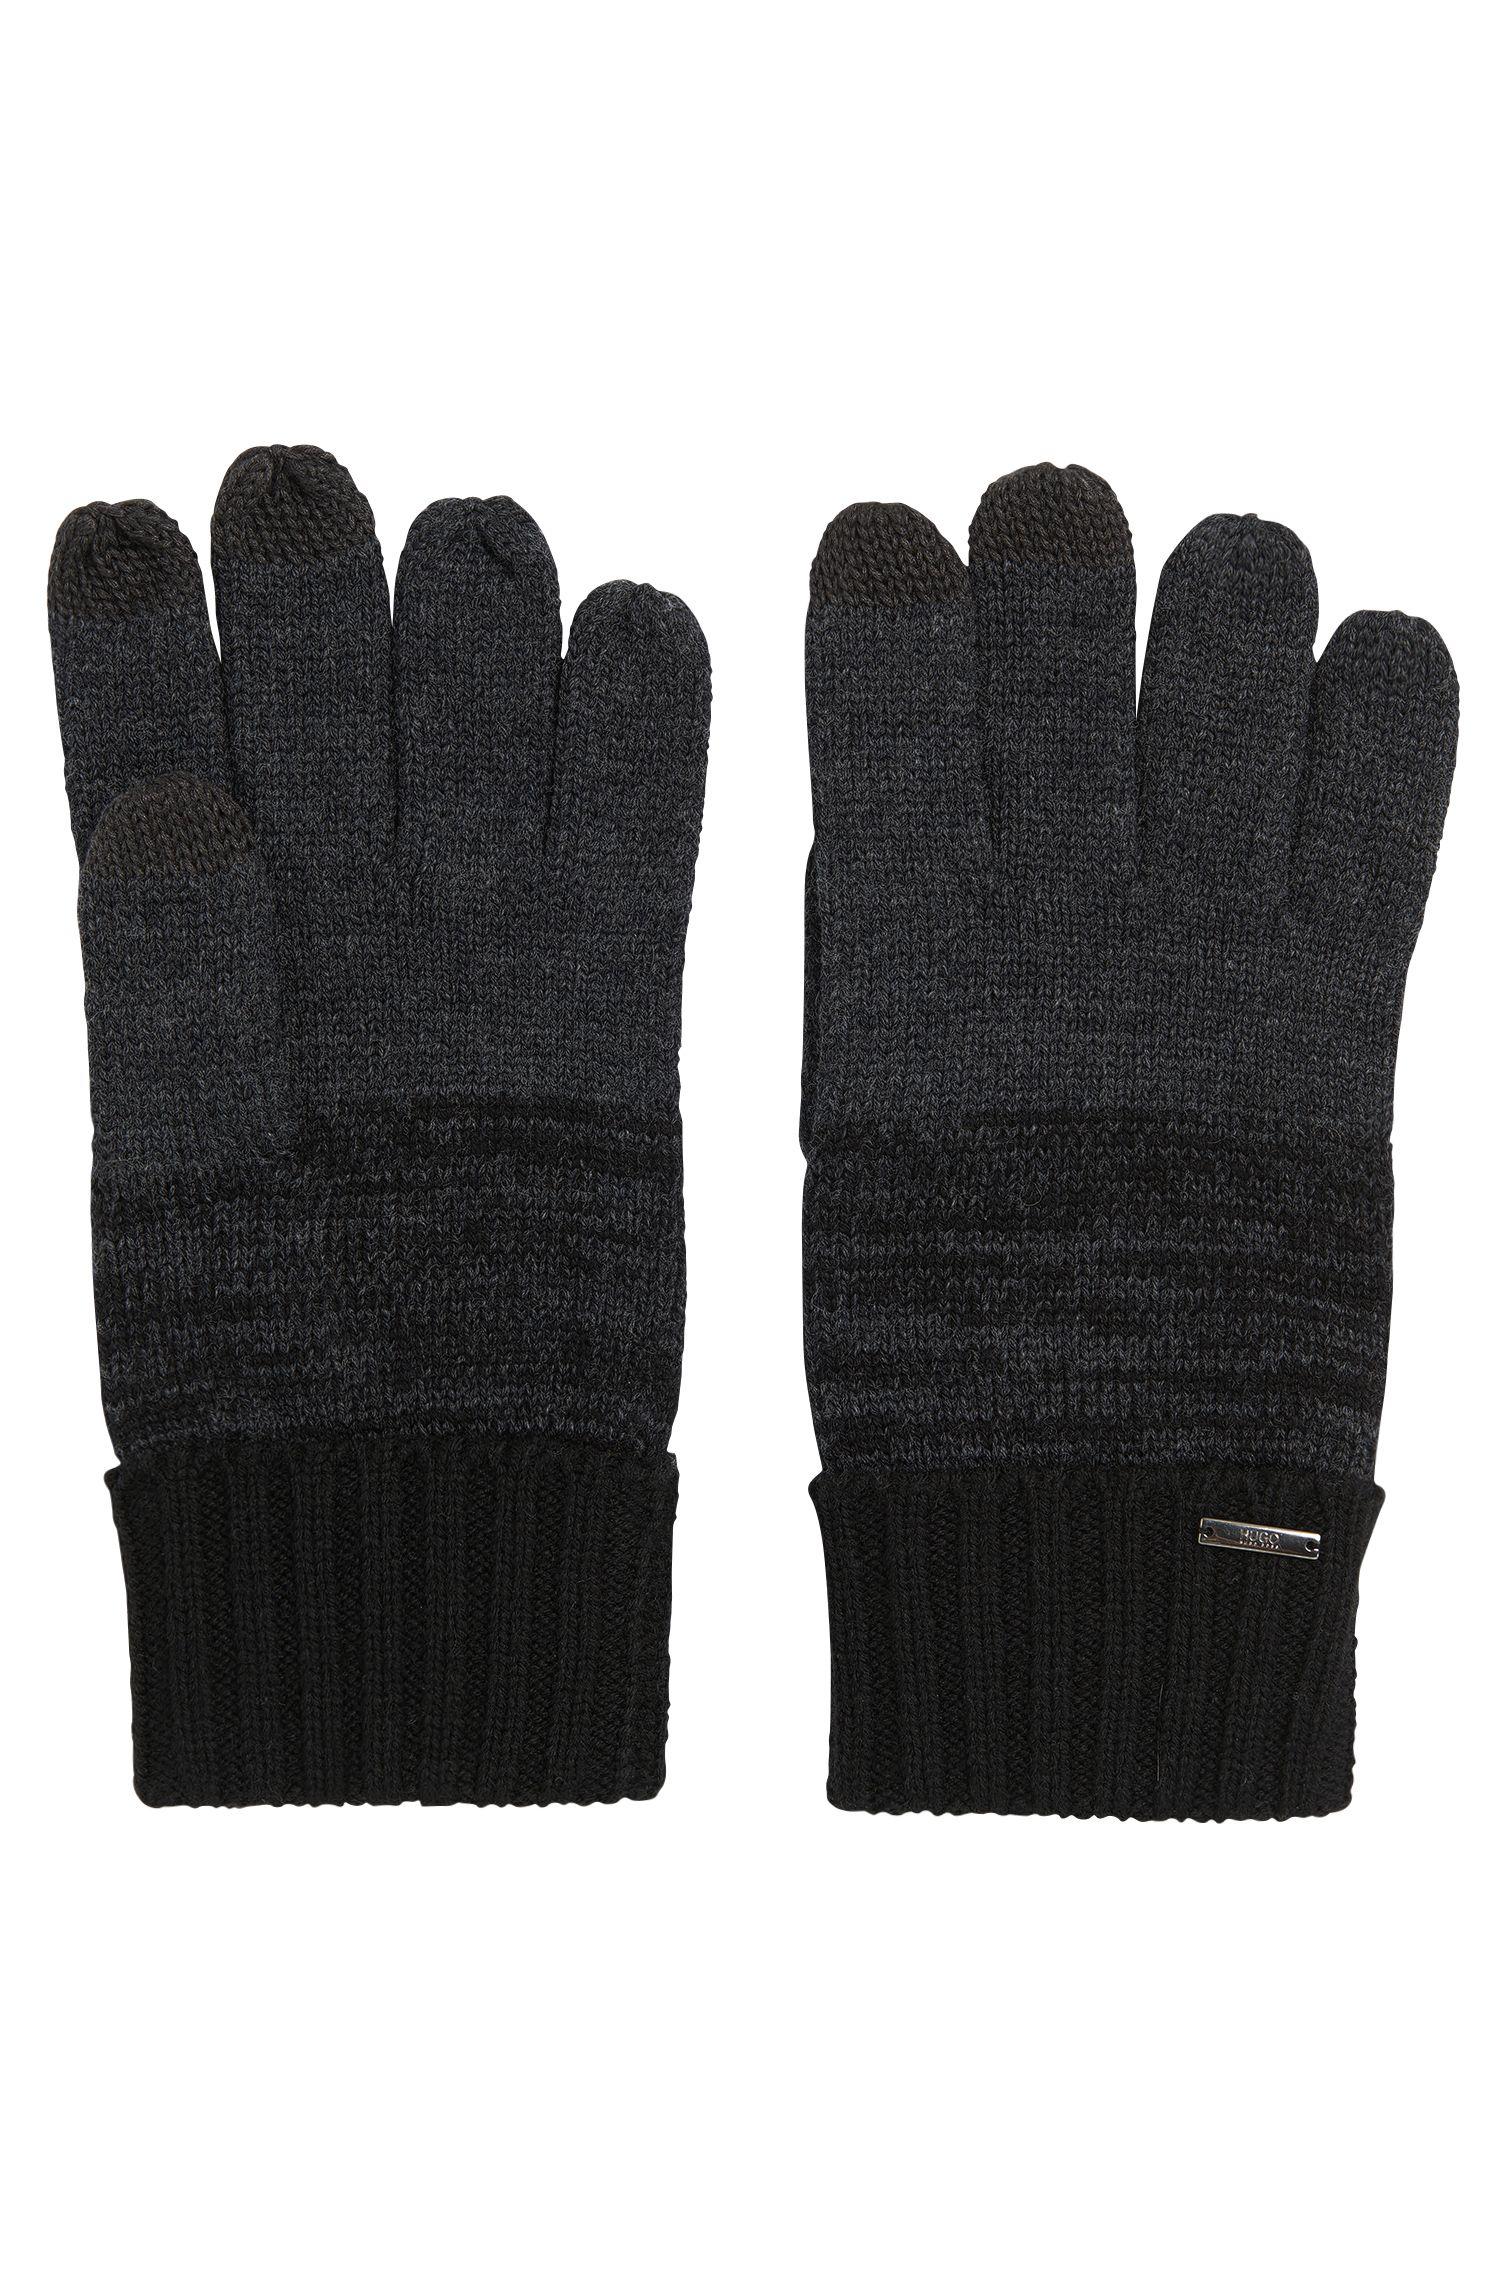 'Men W' | Virgin Wool Touchscreen Knit Gloves